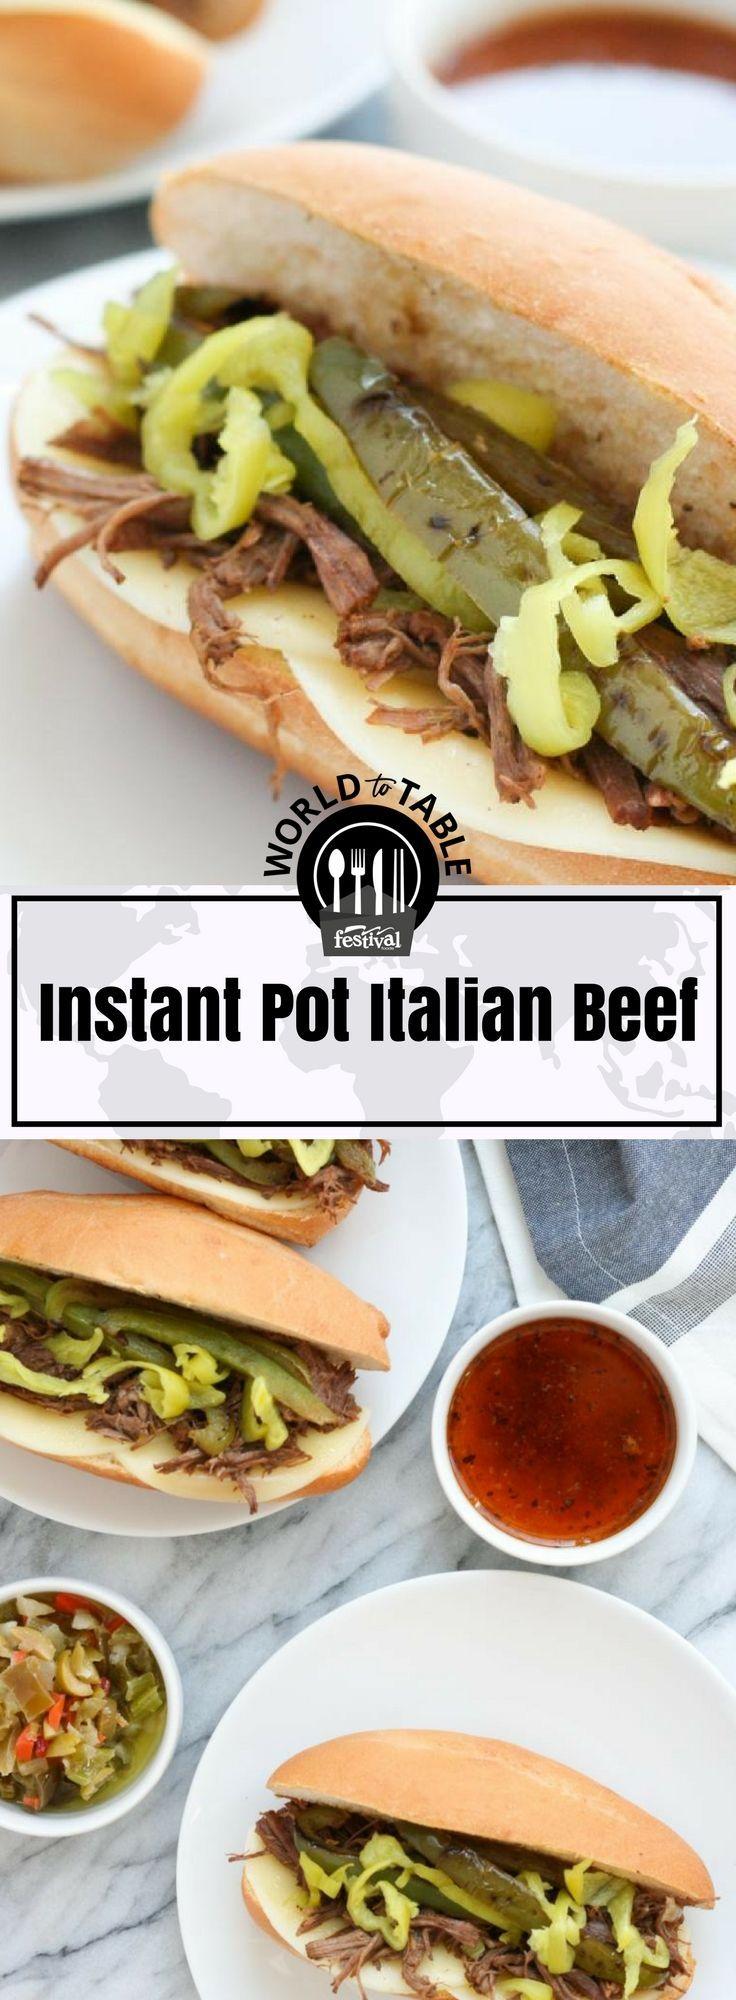 Instant Pot Italian Beef Sandwiches Recipe Italian